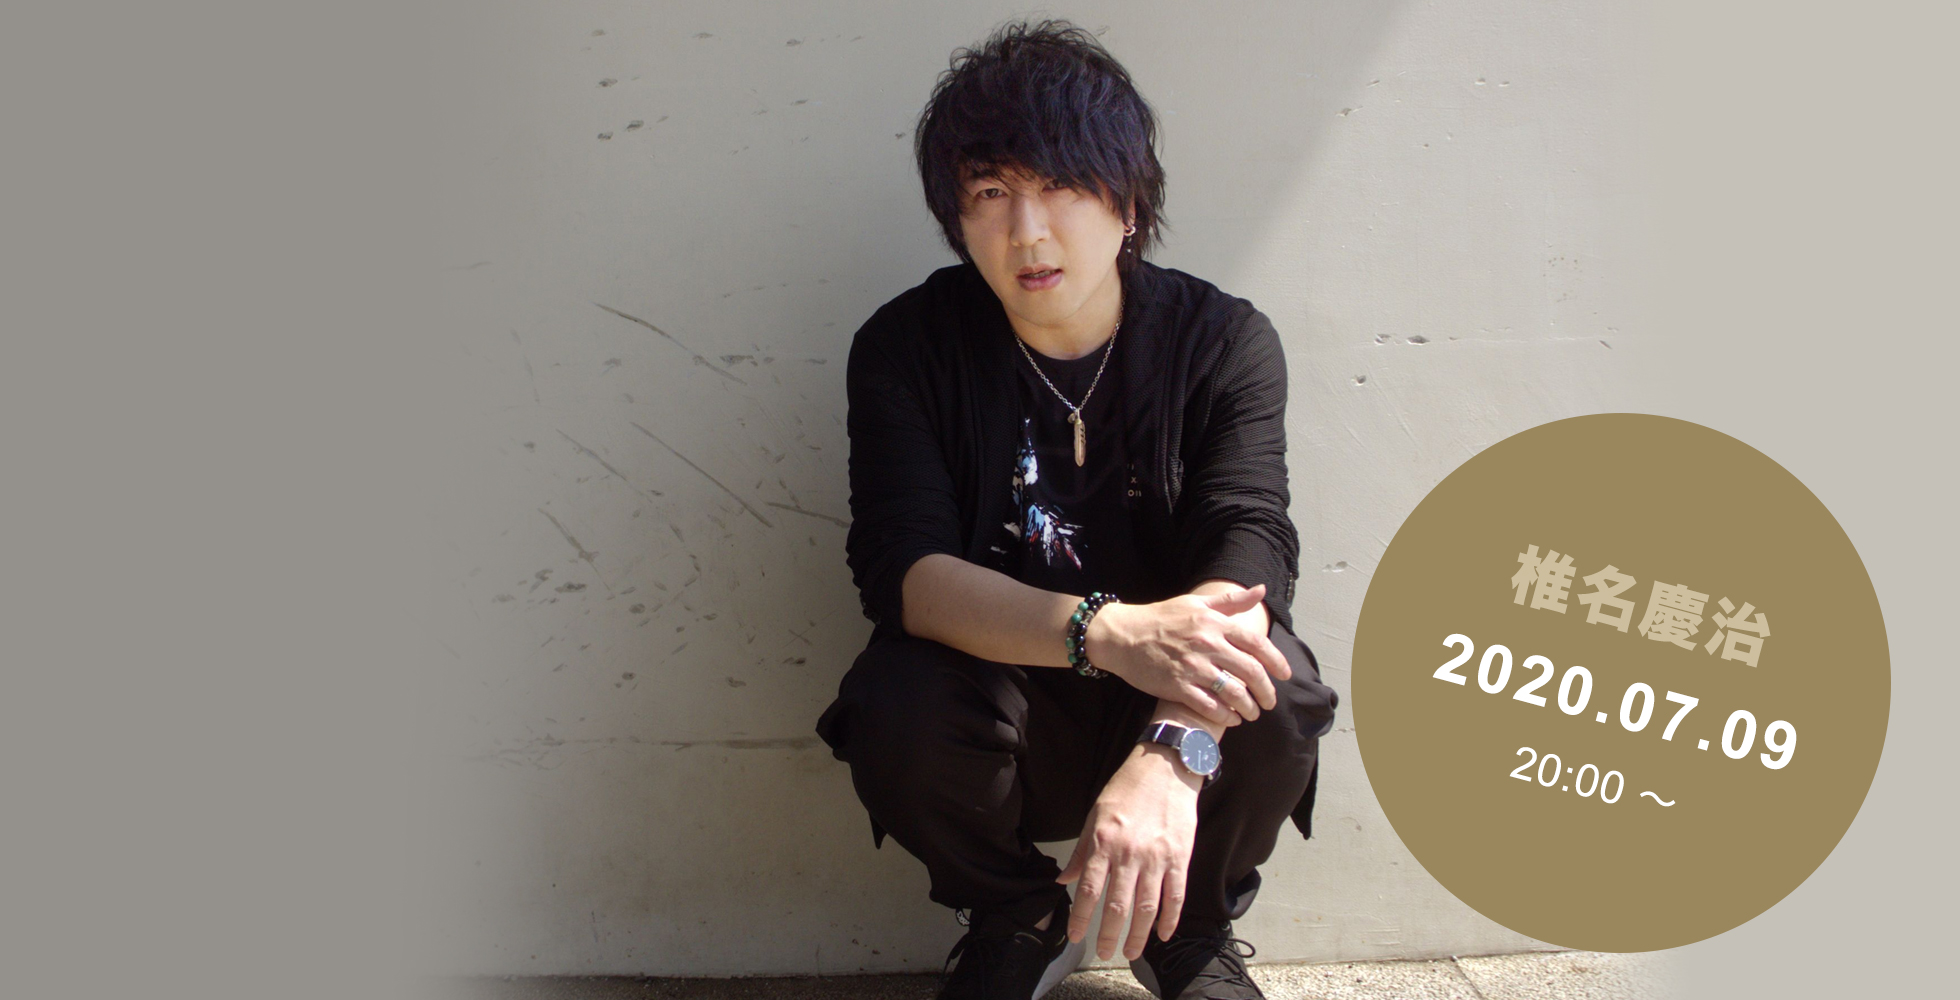 YOSHIHARU SHIINA ONLINE LIVE「FACE TO FACE REMOTE」